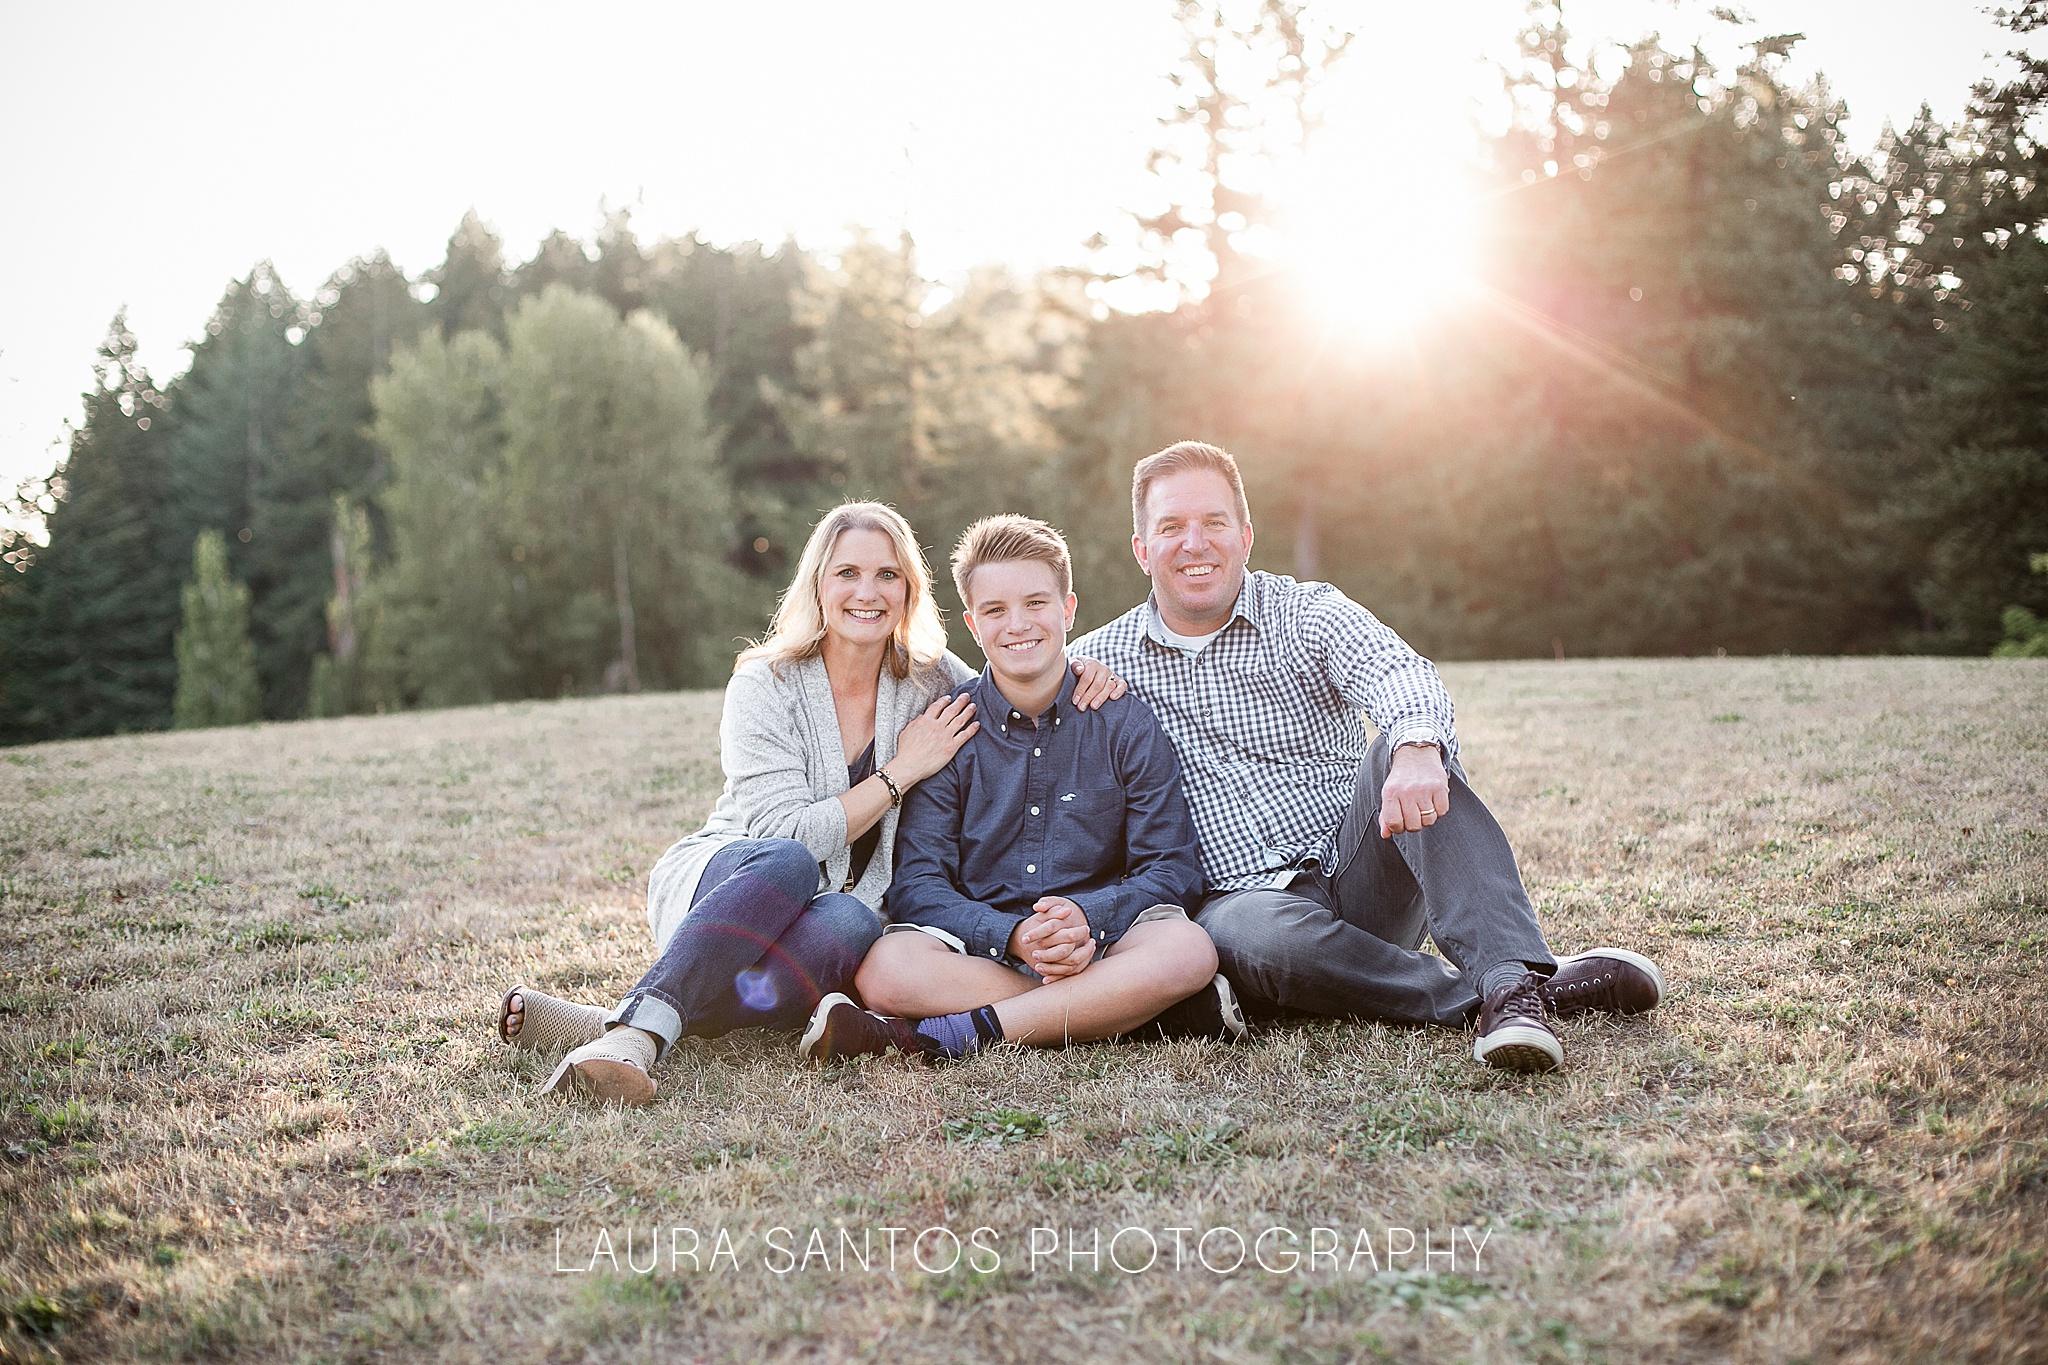 Laura Santos Photography Portland Oregon Family Photographer_0786.jpg